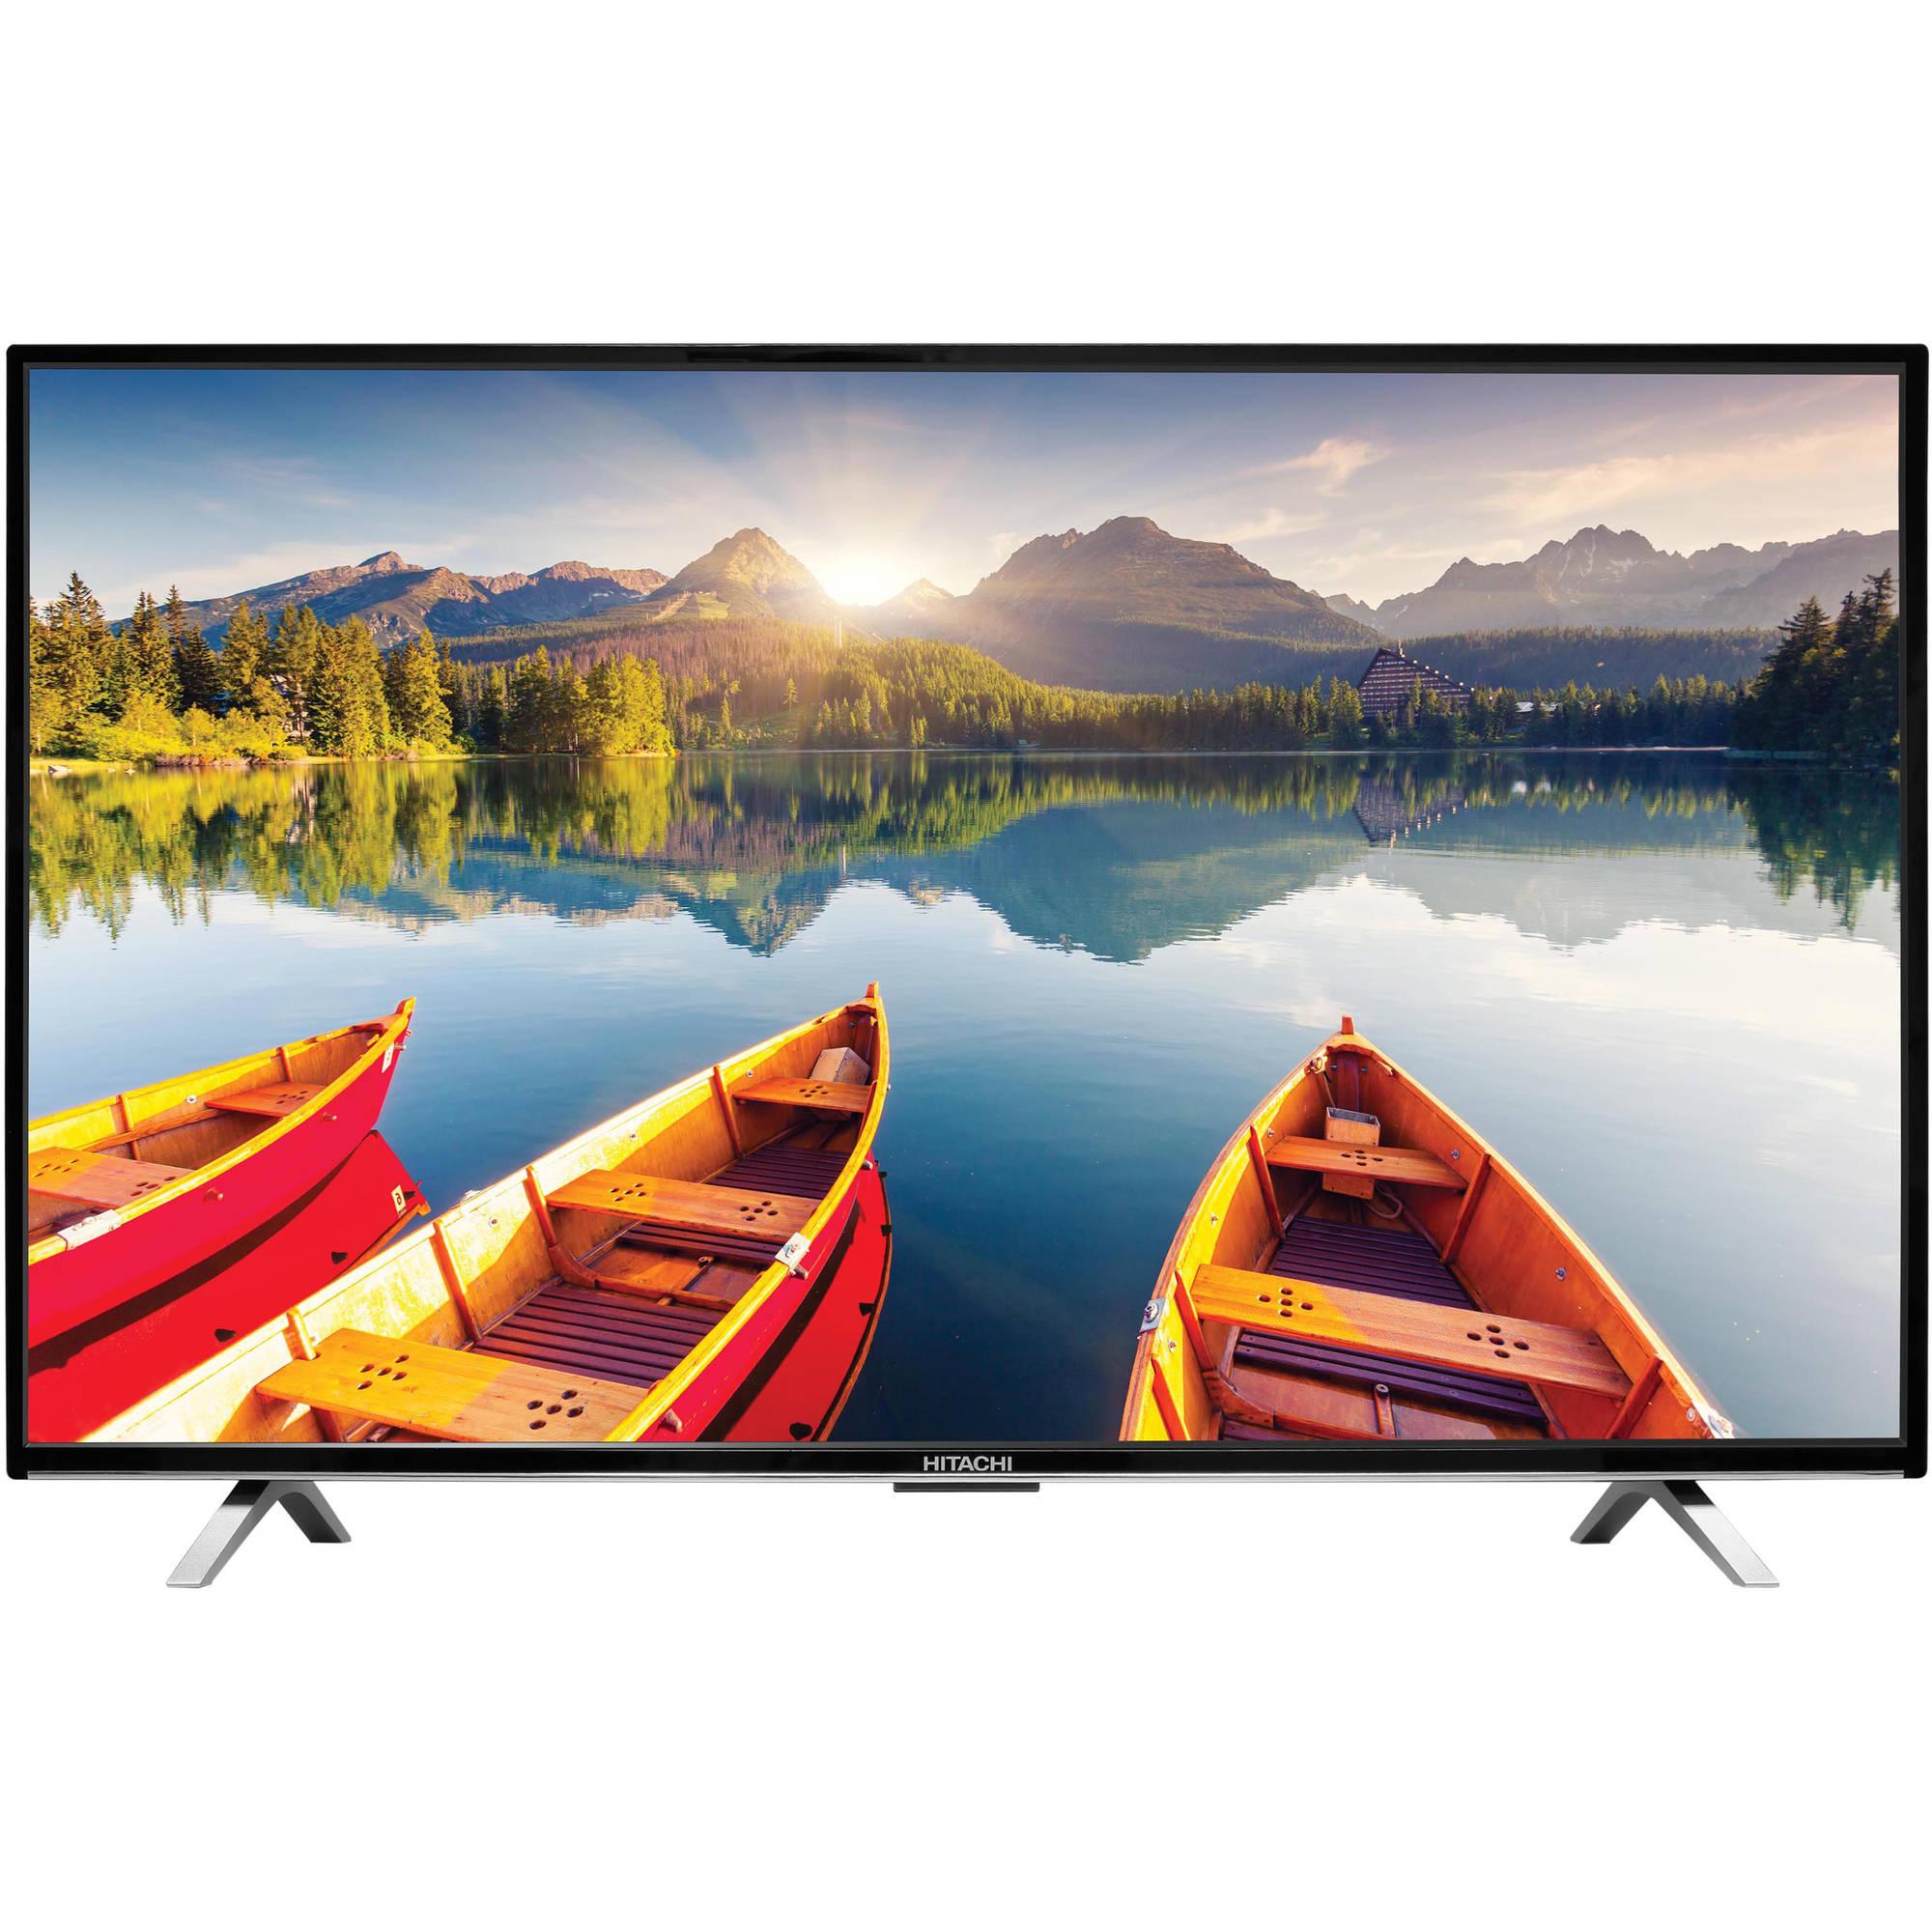 "Hitachi Alpha 32"" Class HD (720p) LED Smart TV (LE32M4S9)"